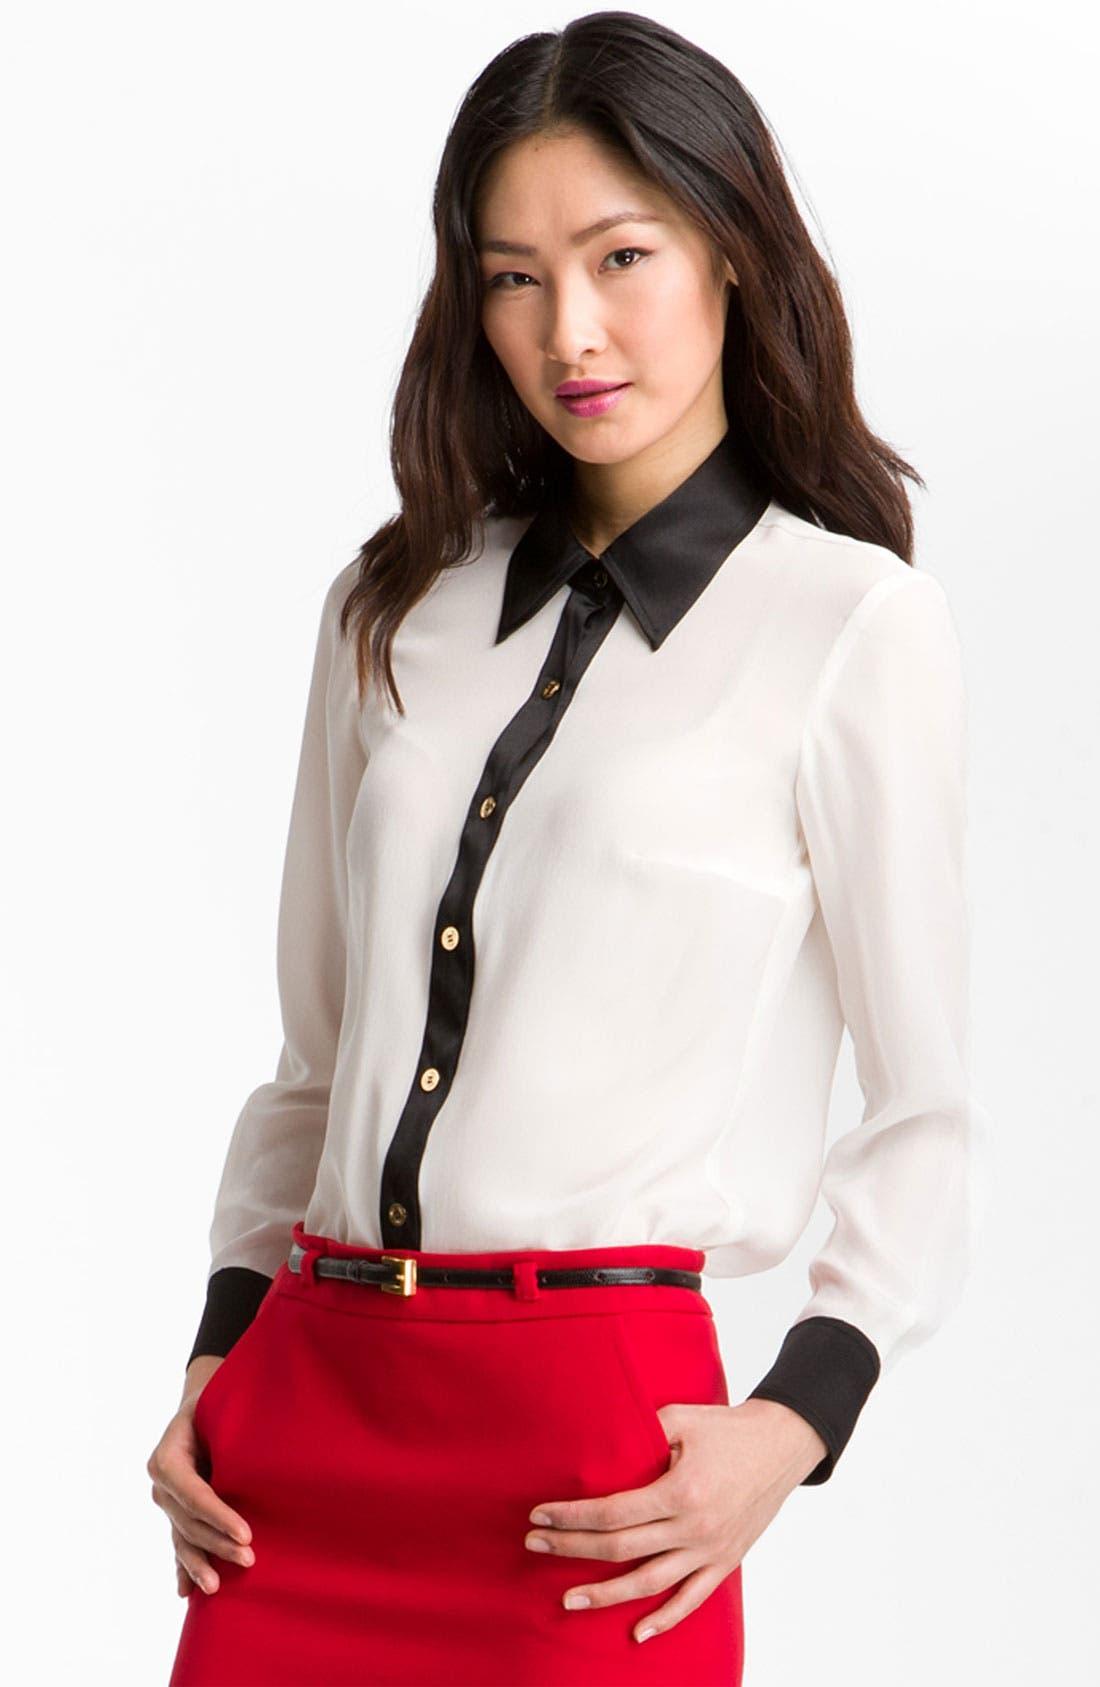 Alternate Image 1 Selected - Trina Turk 'Carrlyne 2' Contrast Trim Shirt